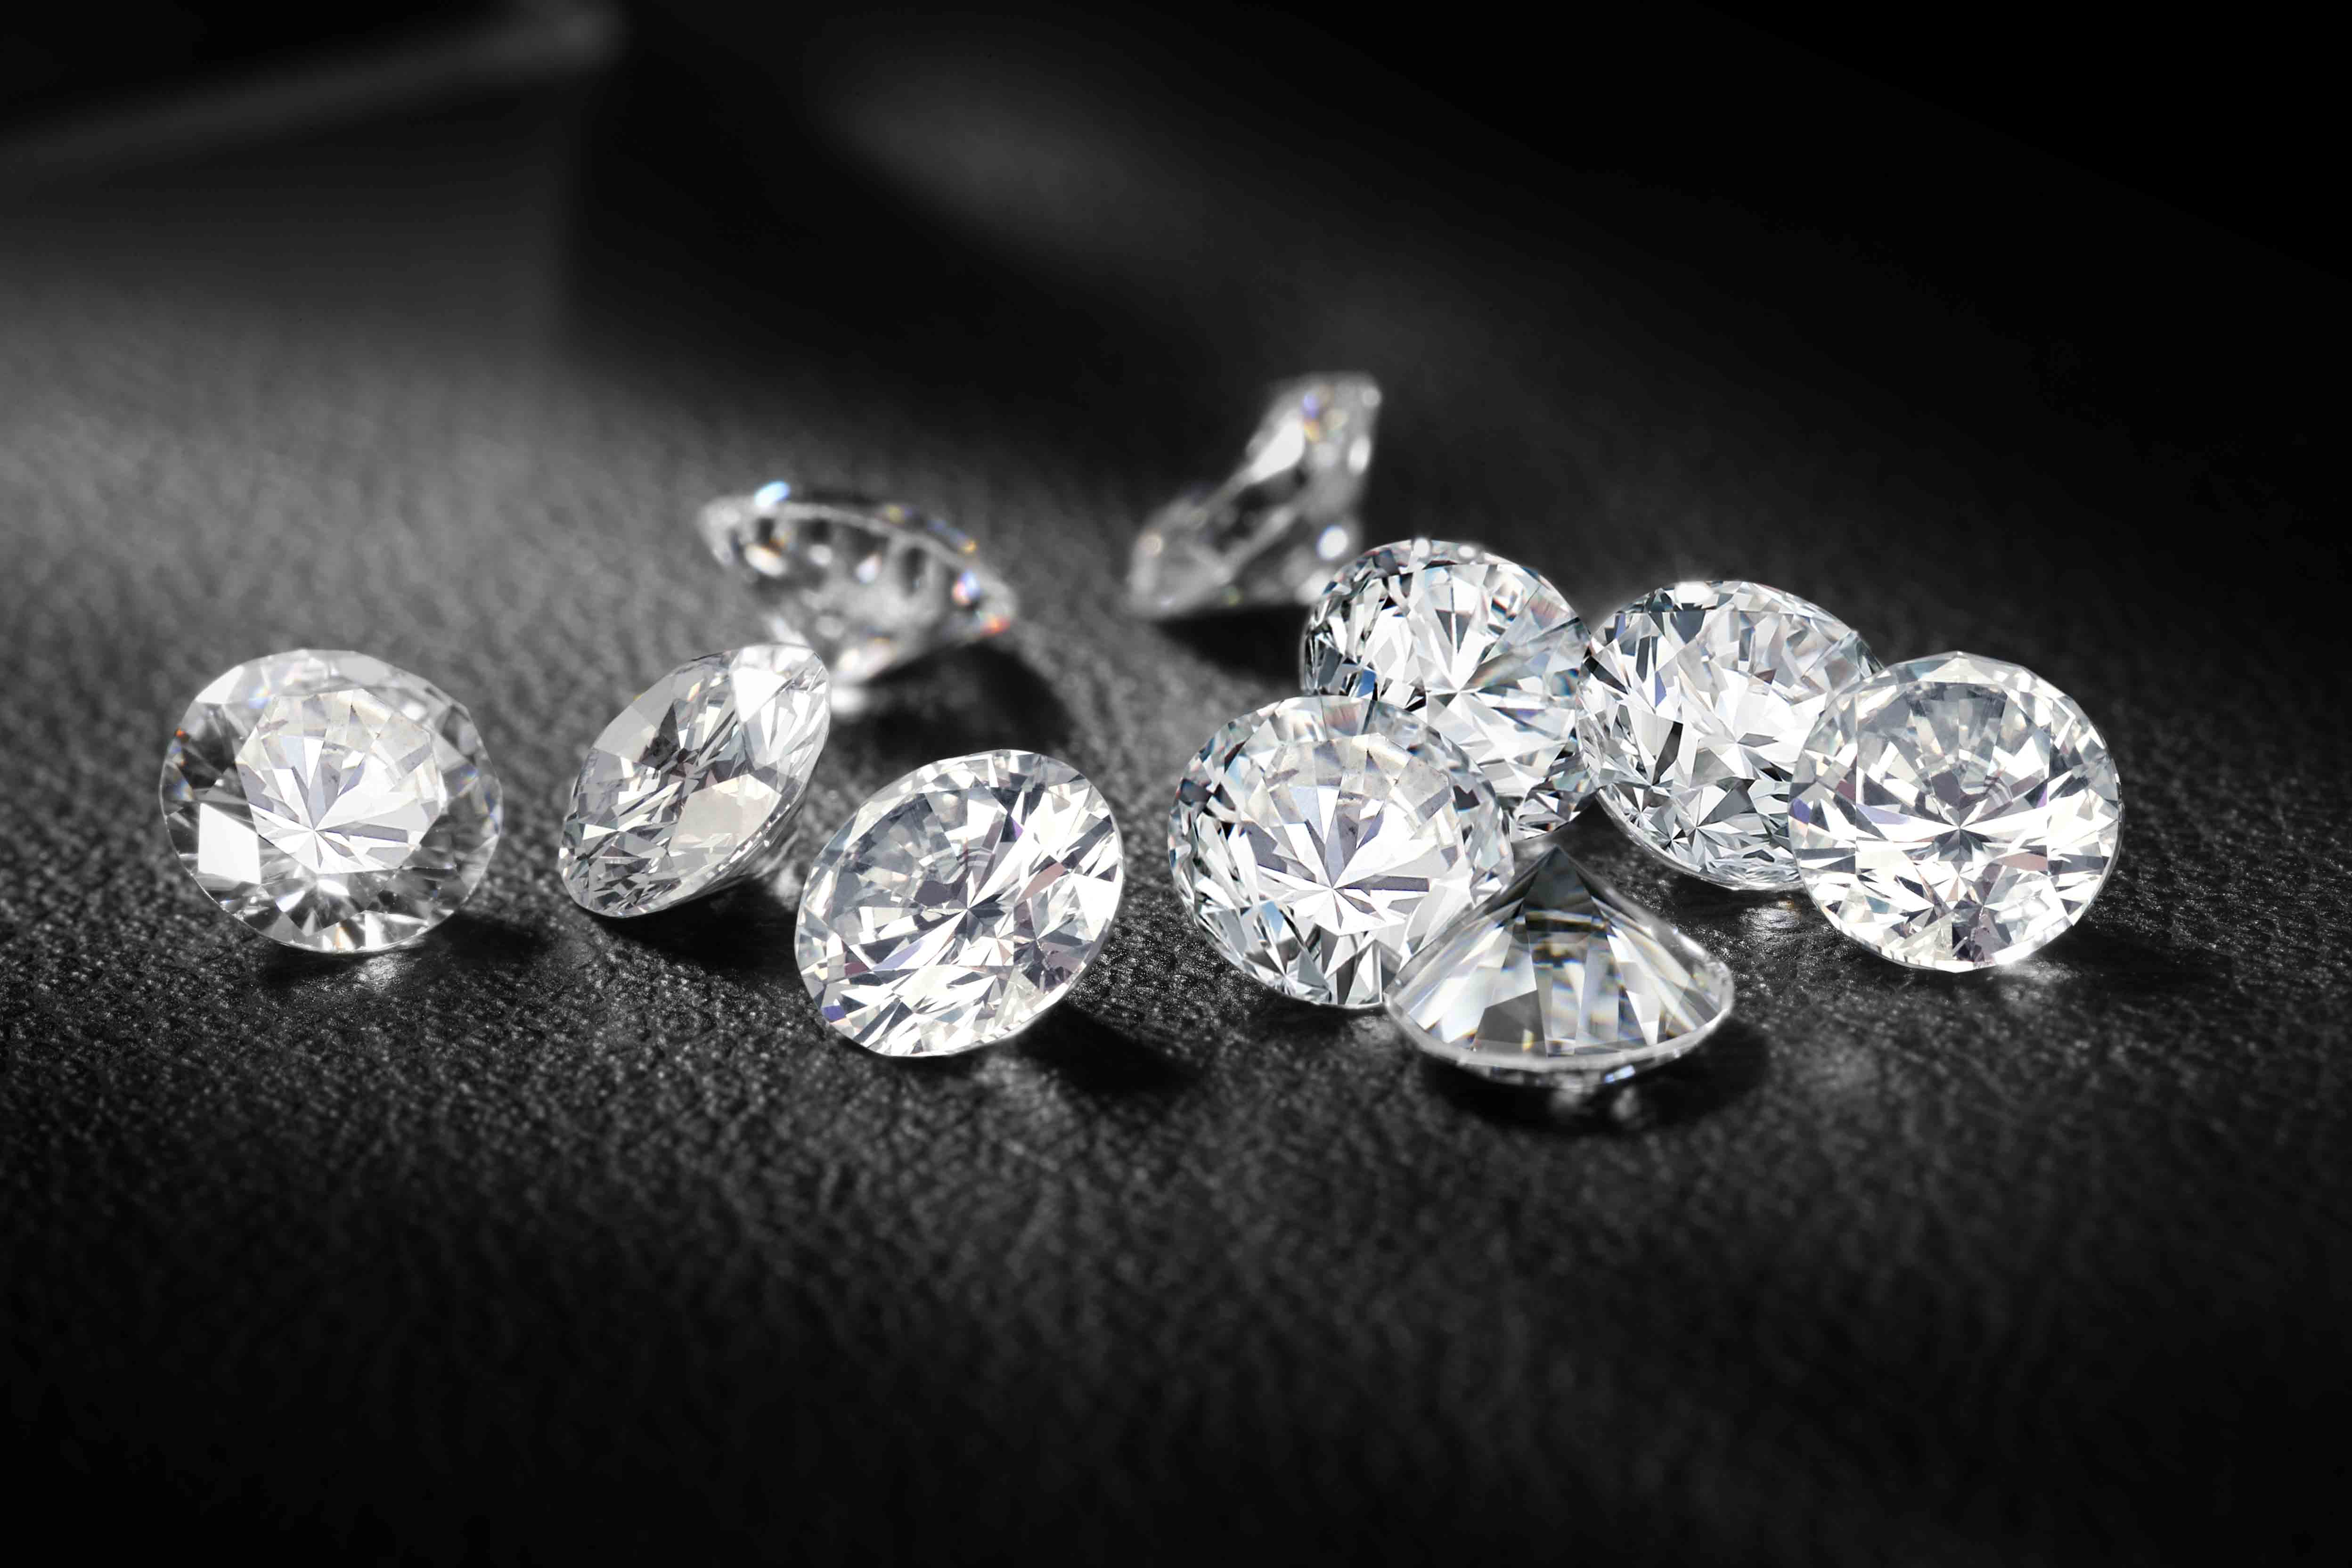 Sparkling Diamond Wallpaper   Sparkling Diamond 4992x3328